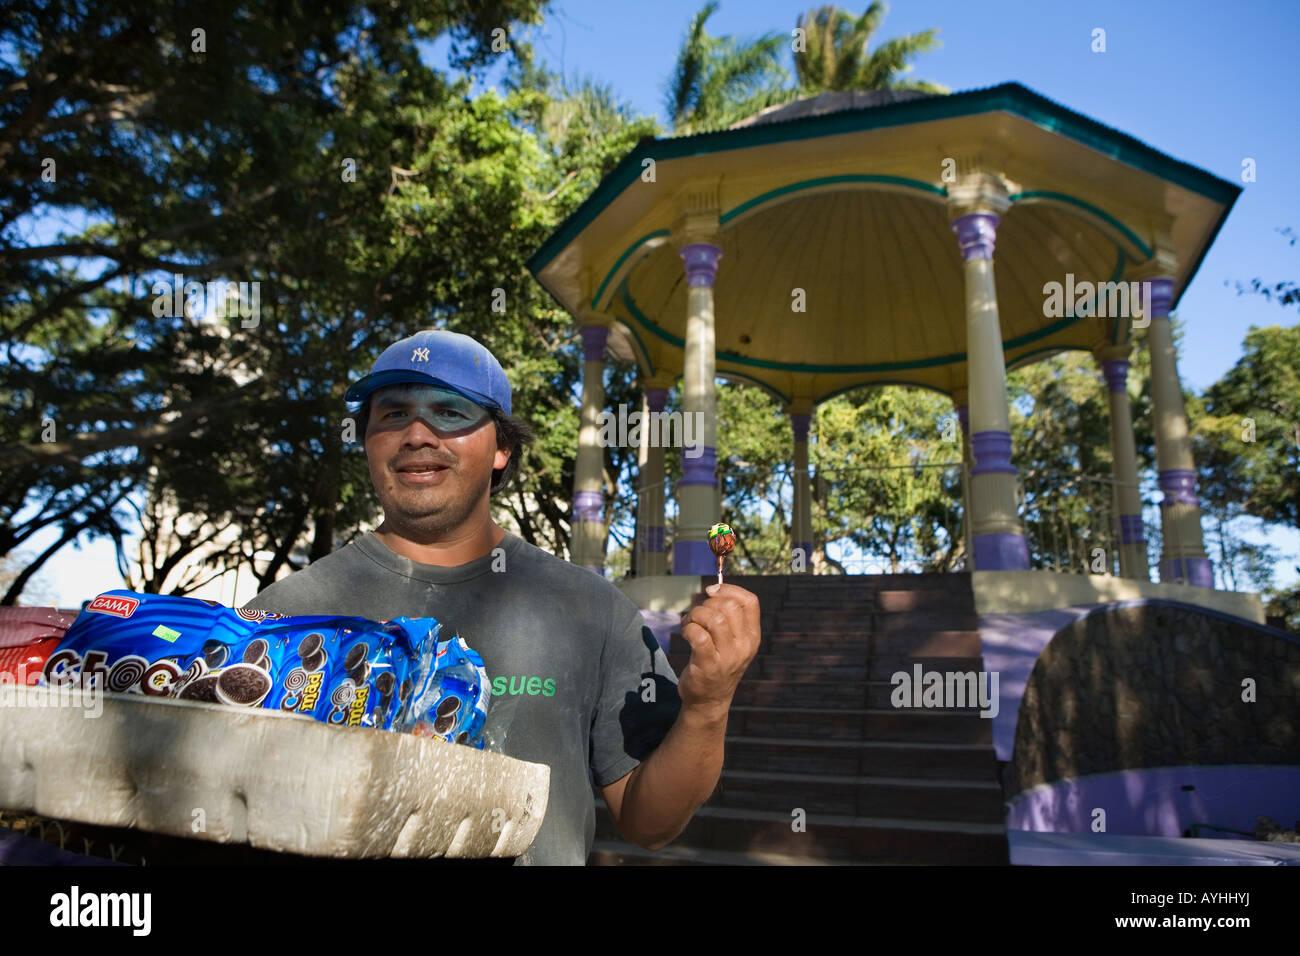 Candy vendor and bandstand gazebo Jinotepe Nicaragua - Stock Image